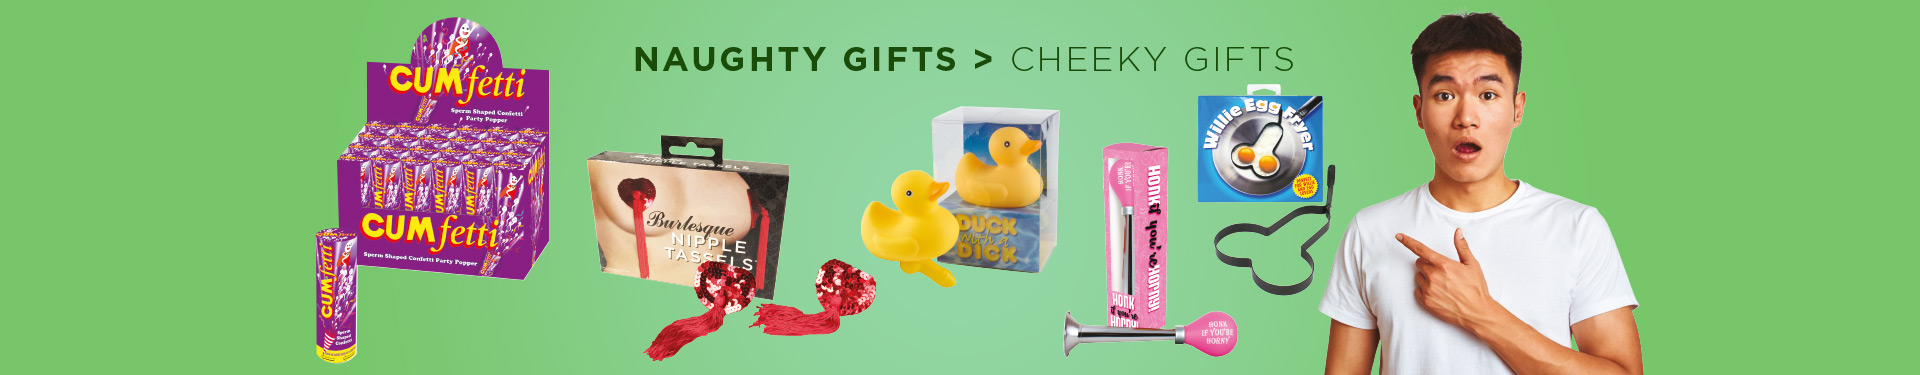 Cheeky Gifts